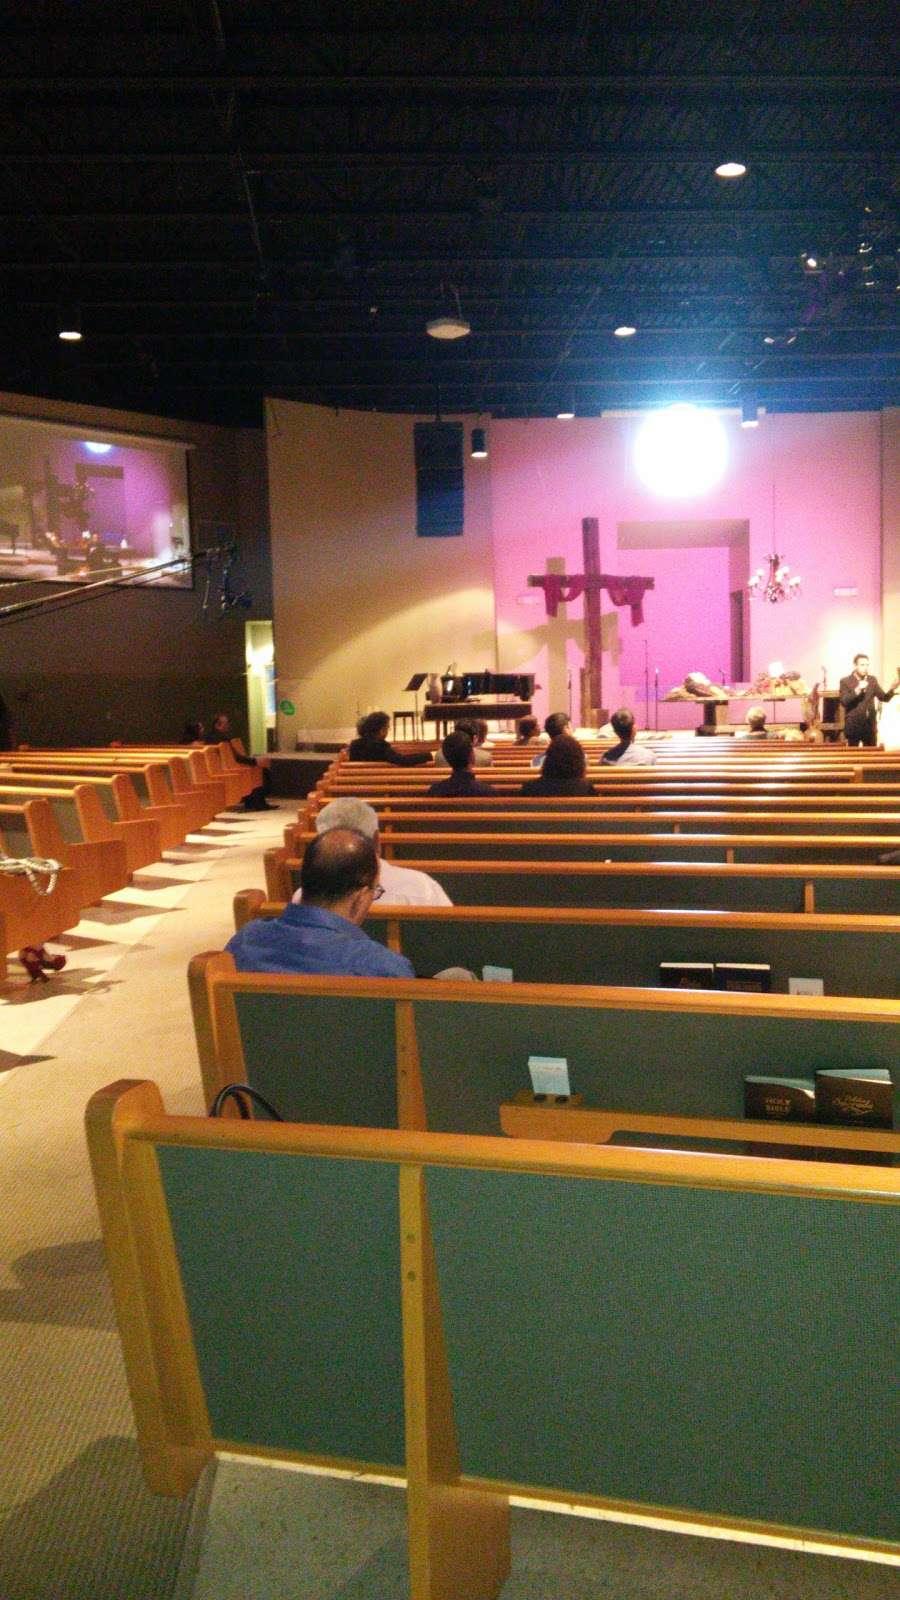 Brazilian Temple SDA Church - church    Photo 6 of 10   Address: 3980 NW 21st Ave, Fort Lauderdale, FL 33309, USA   Phone: (954) 739-9500